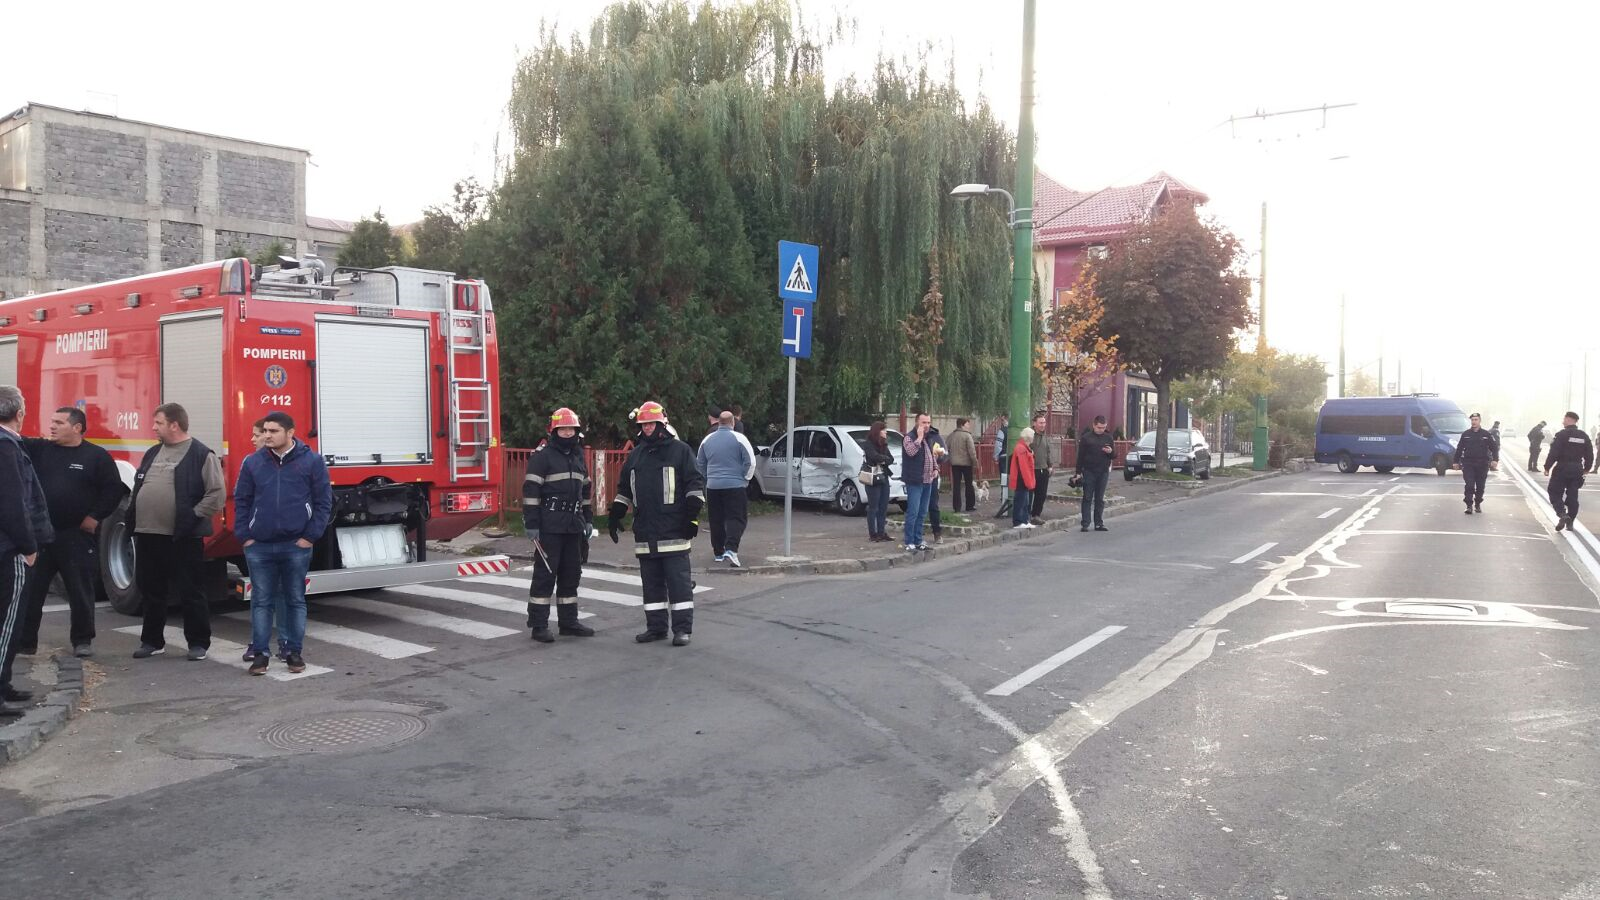 FOTO, VIDEO | Şase persoane au fost rănite într-un accident produs de un taximetrist